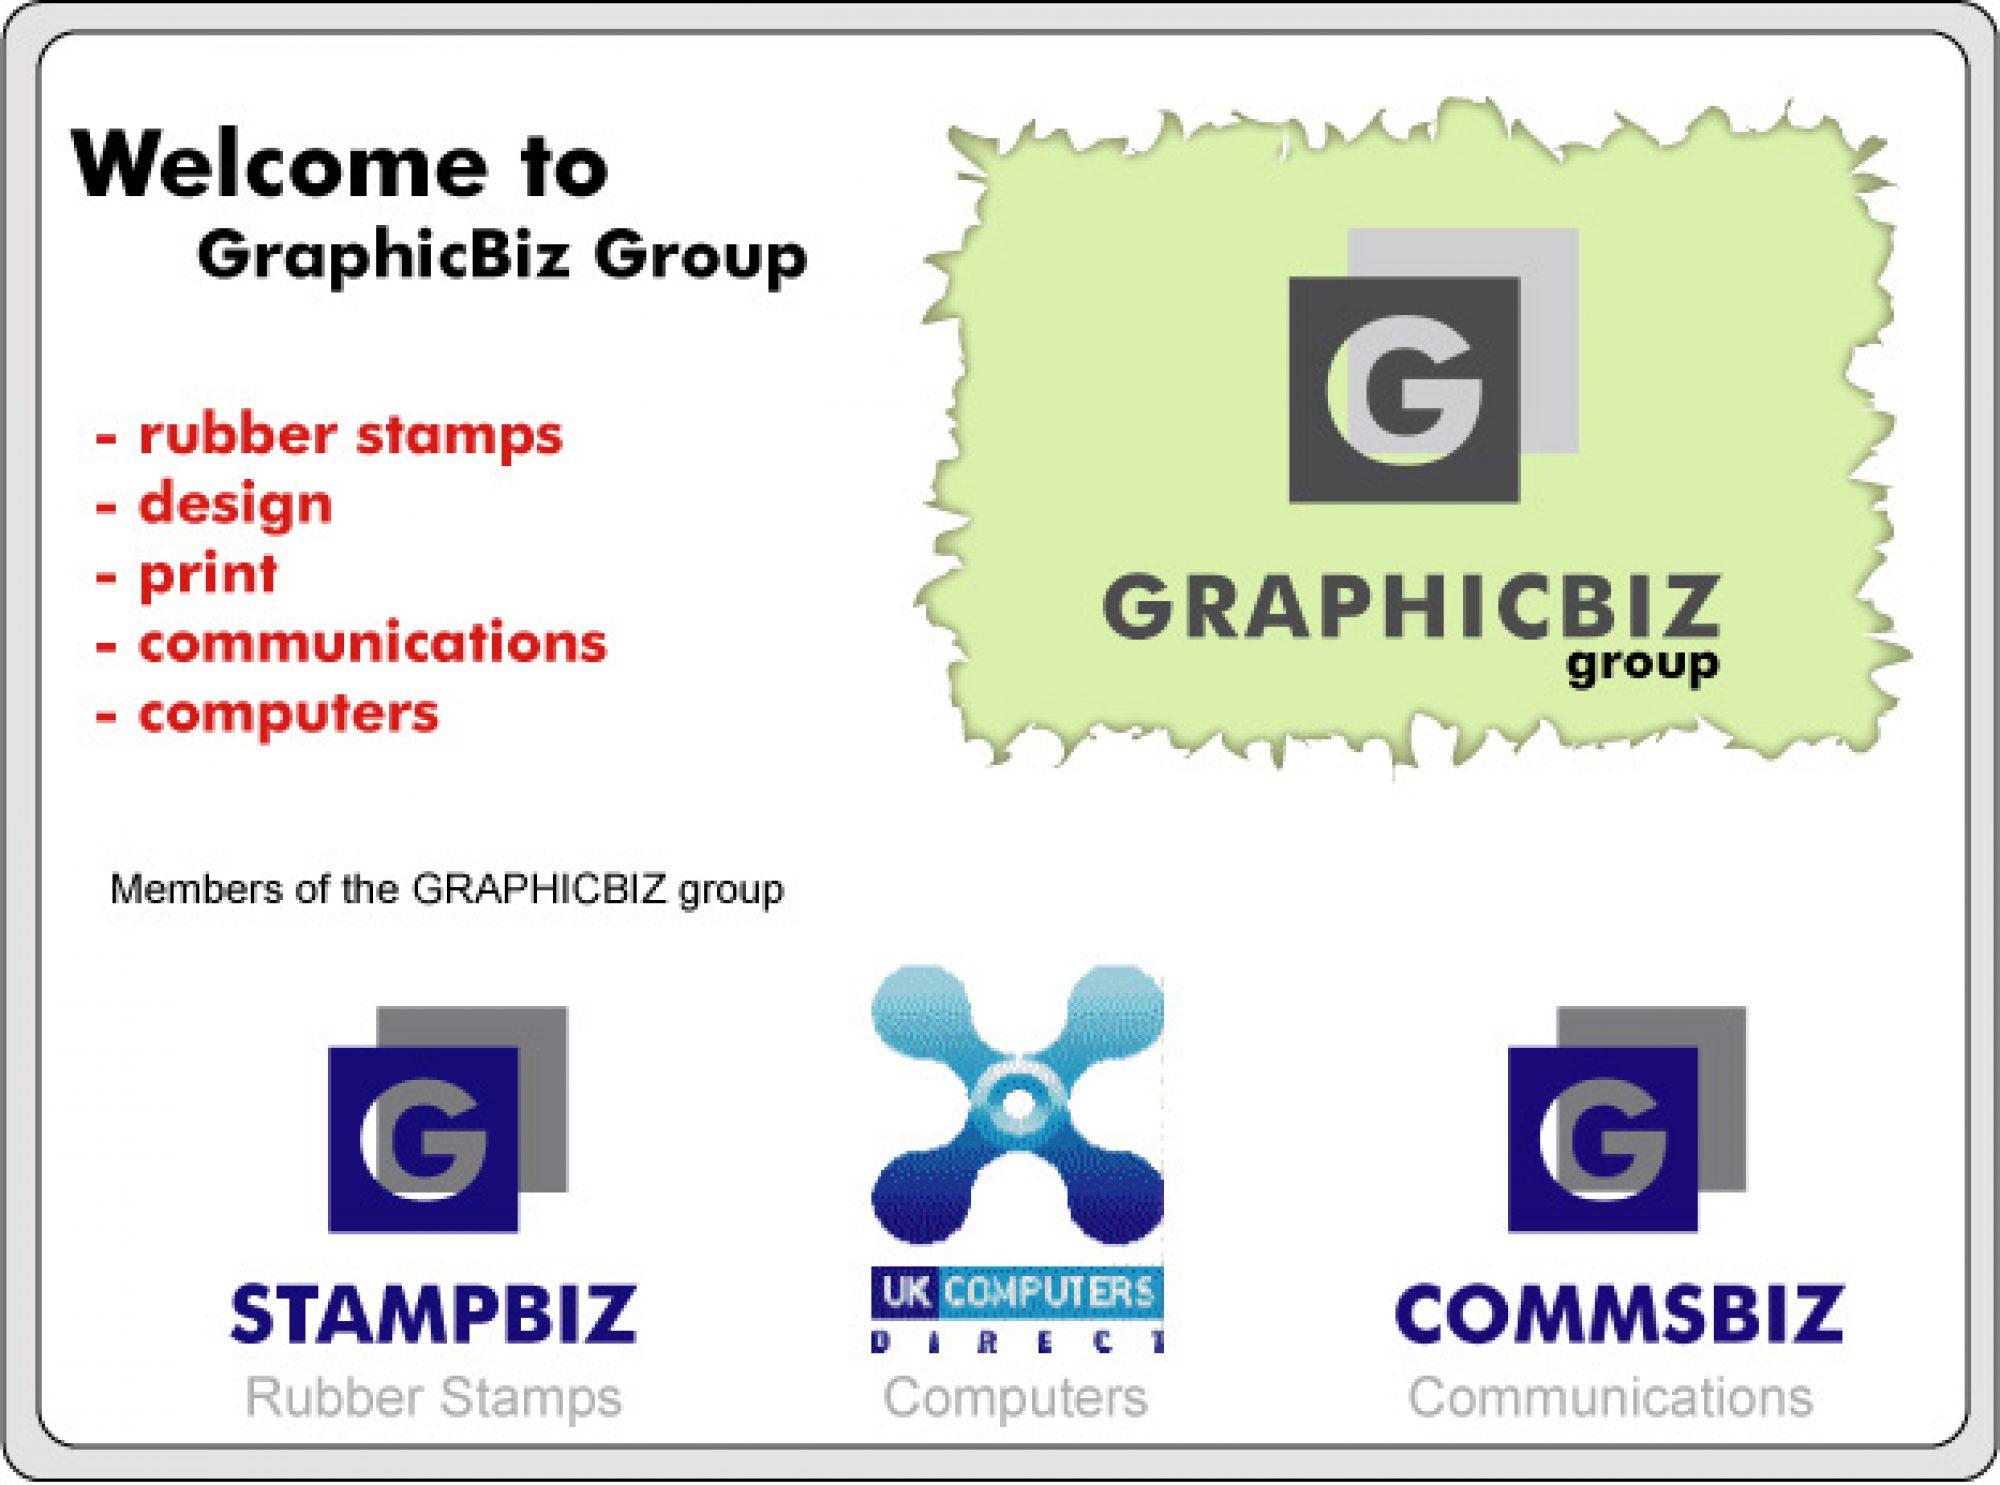 Graphicbiz Group